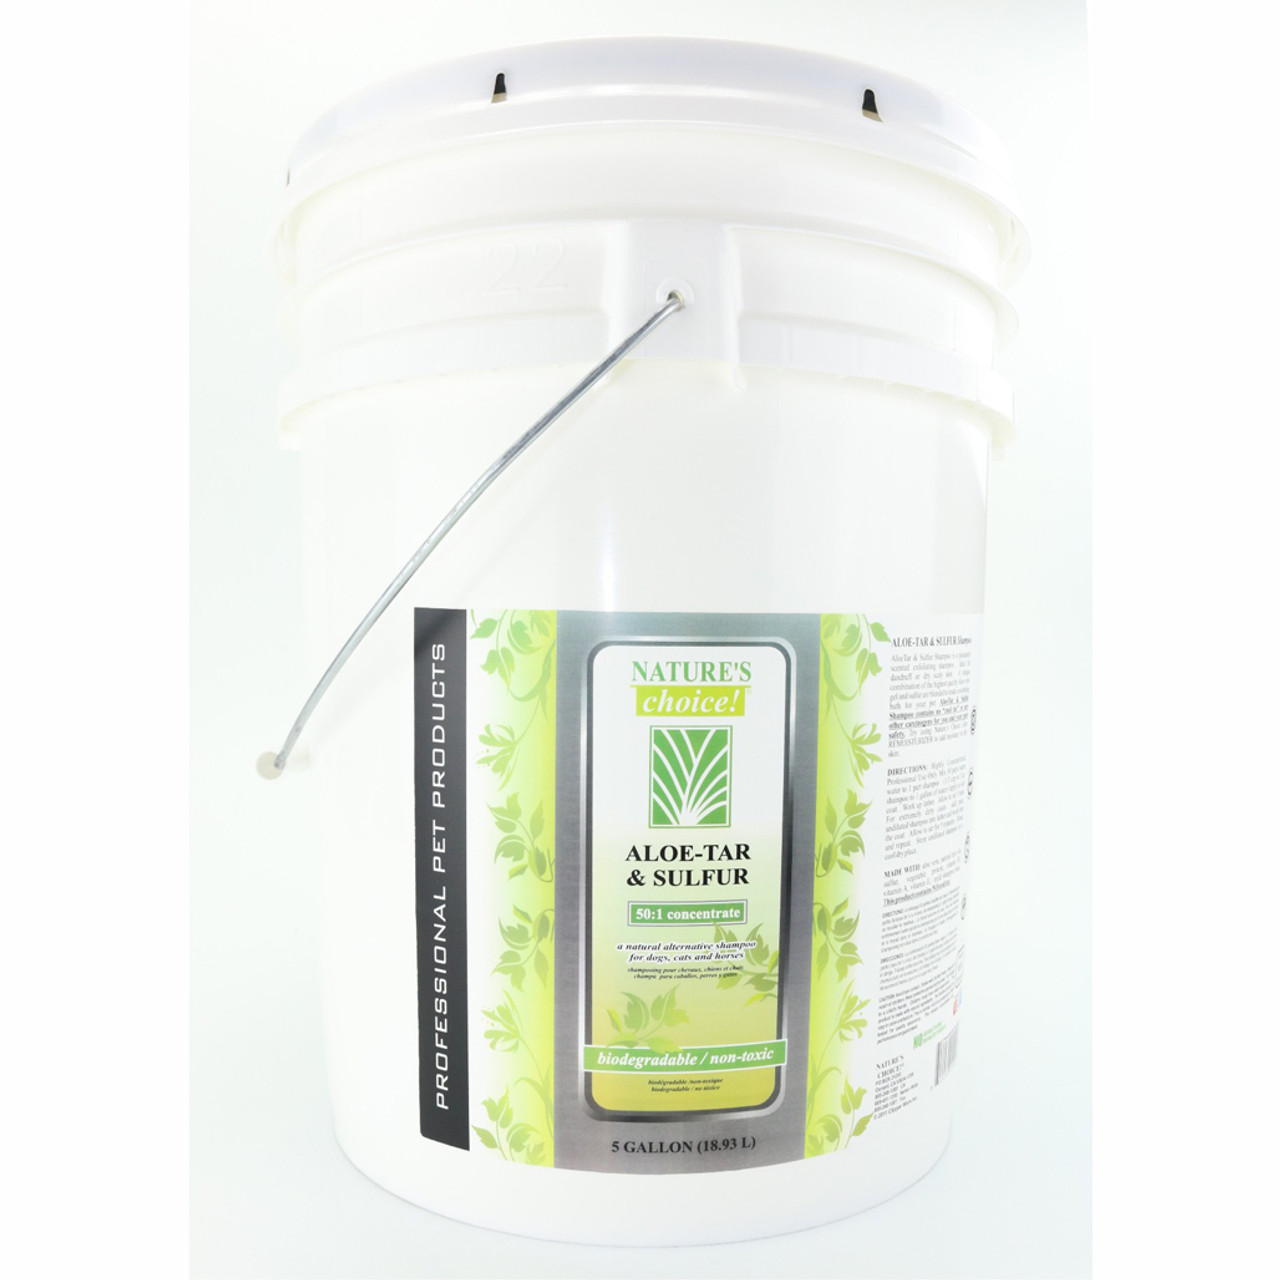 Aloe-Tar & Sulfur in 5 Gallon size.